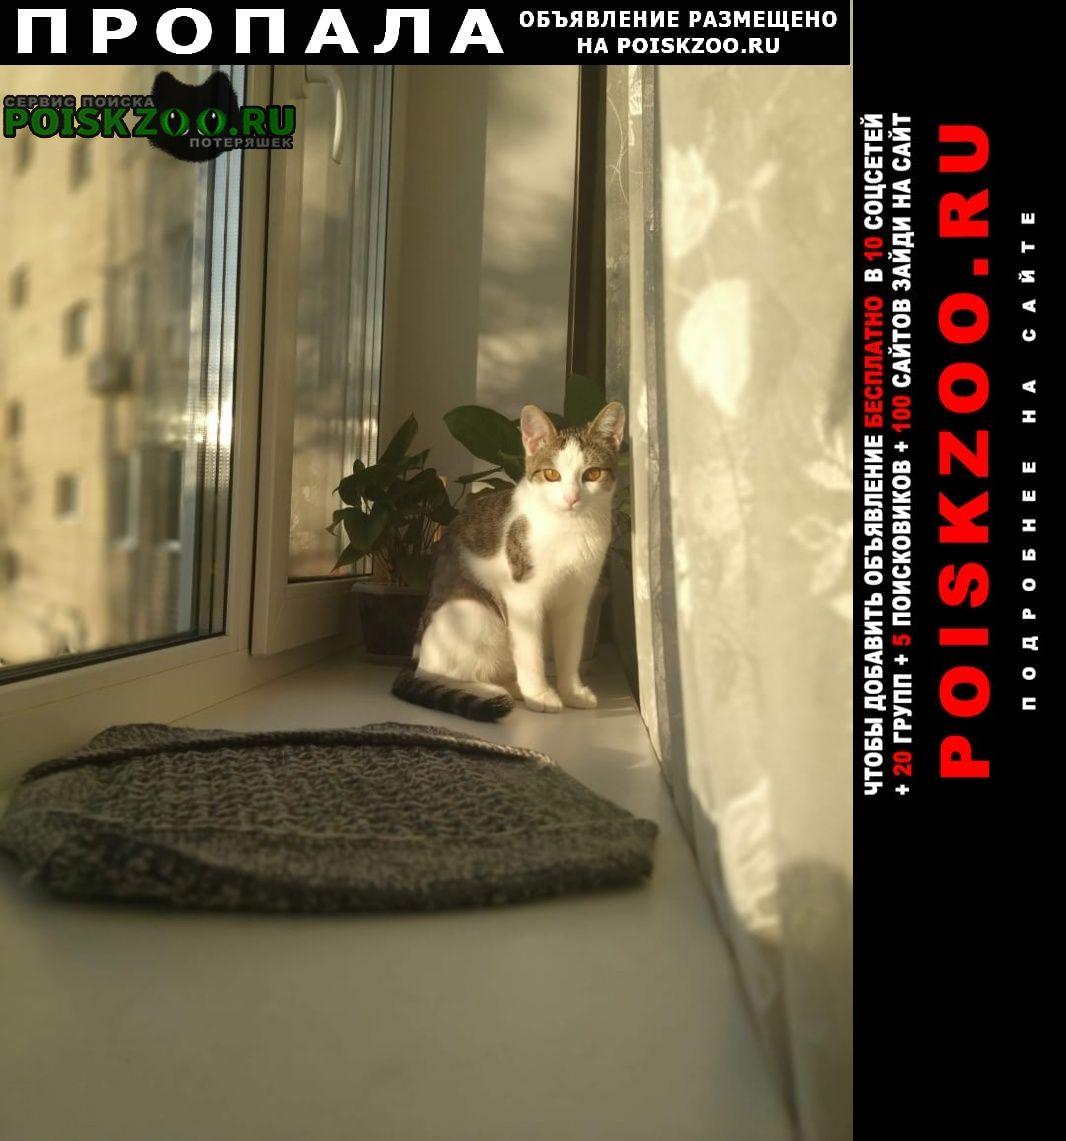 Саратов Пропала кошка домашняя .